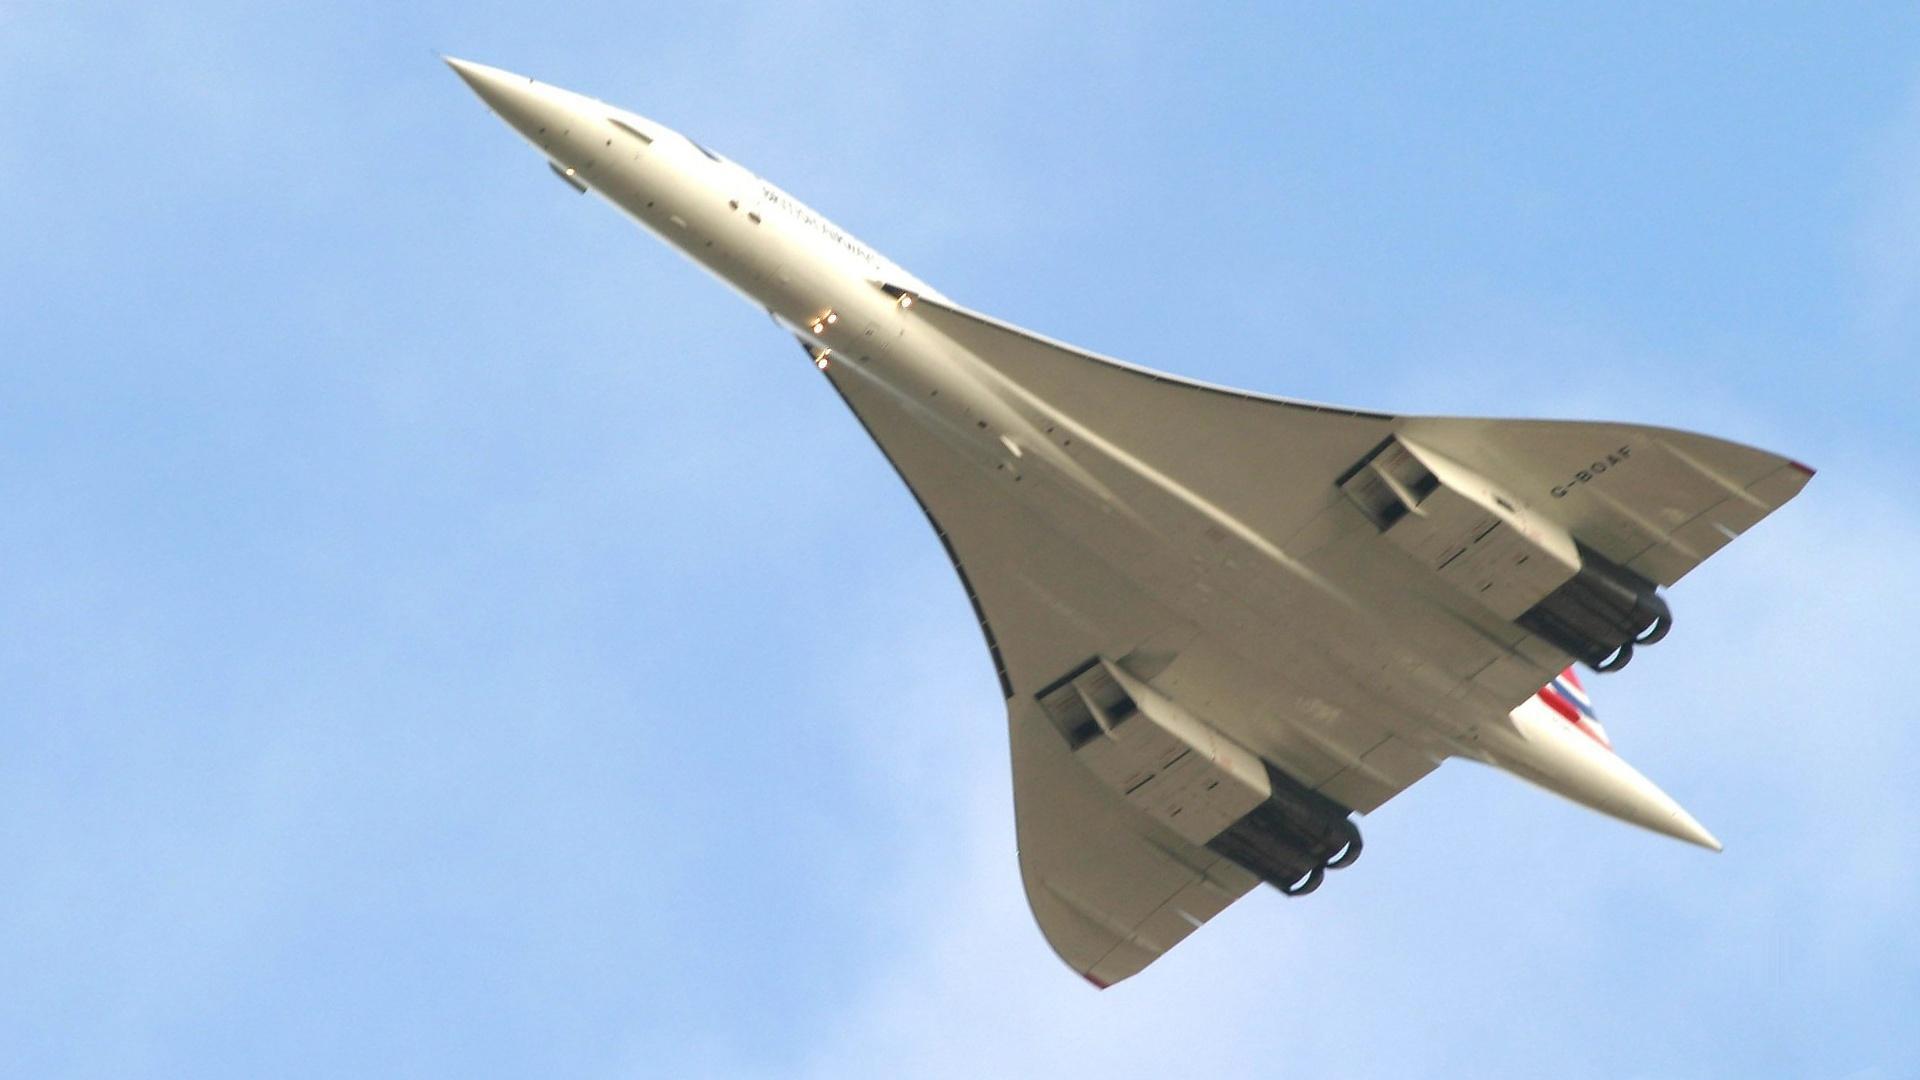 Flying Supersonic Nova Pbs